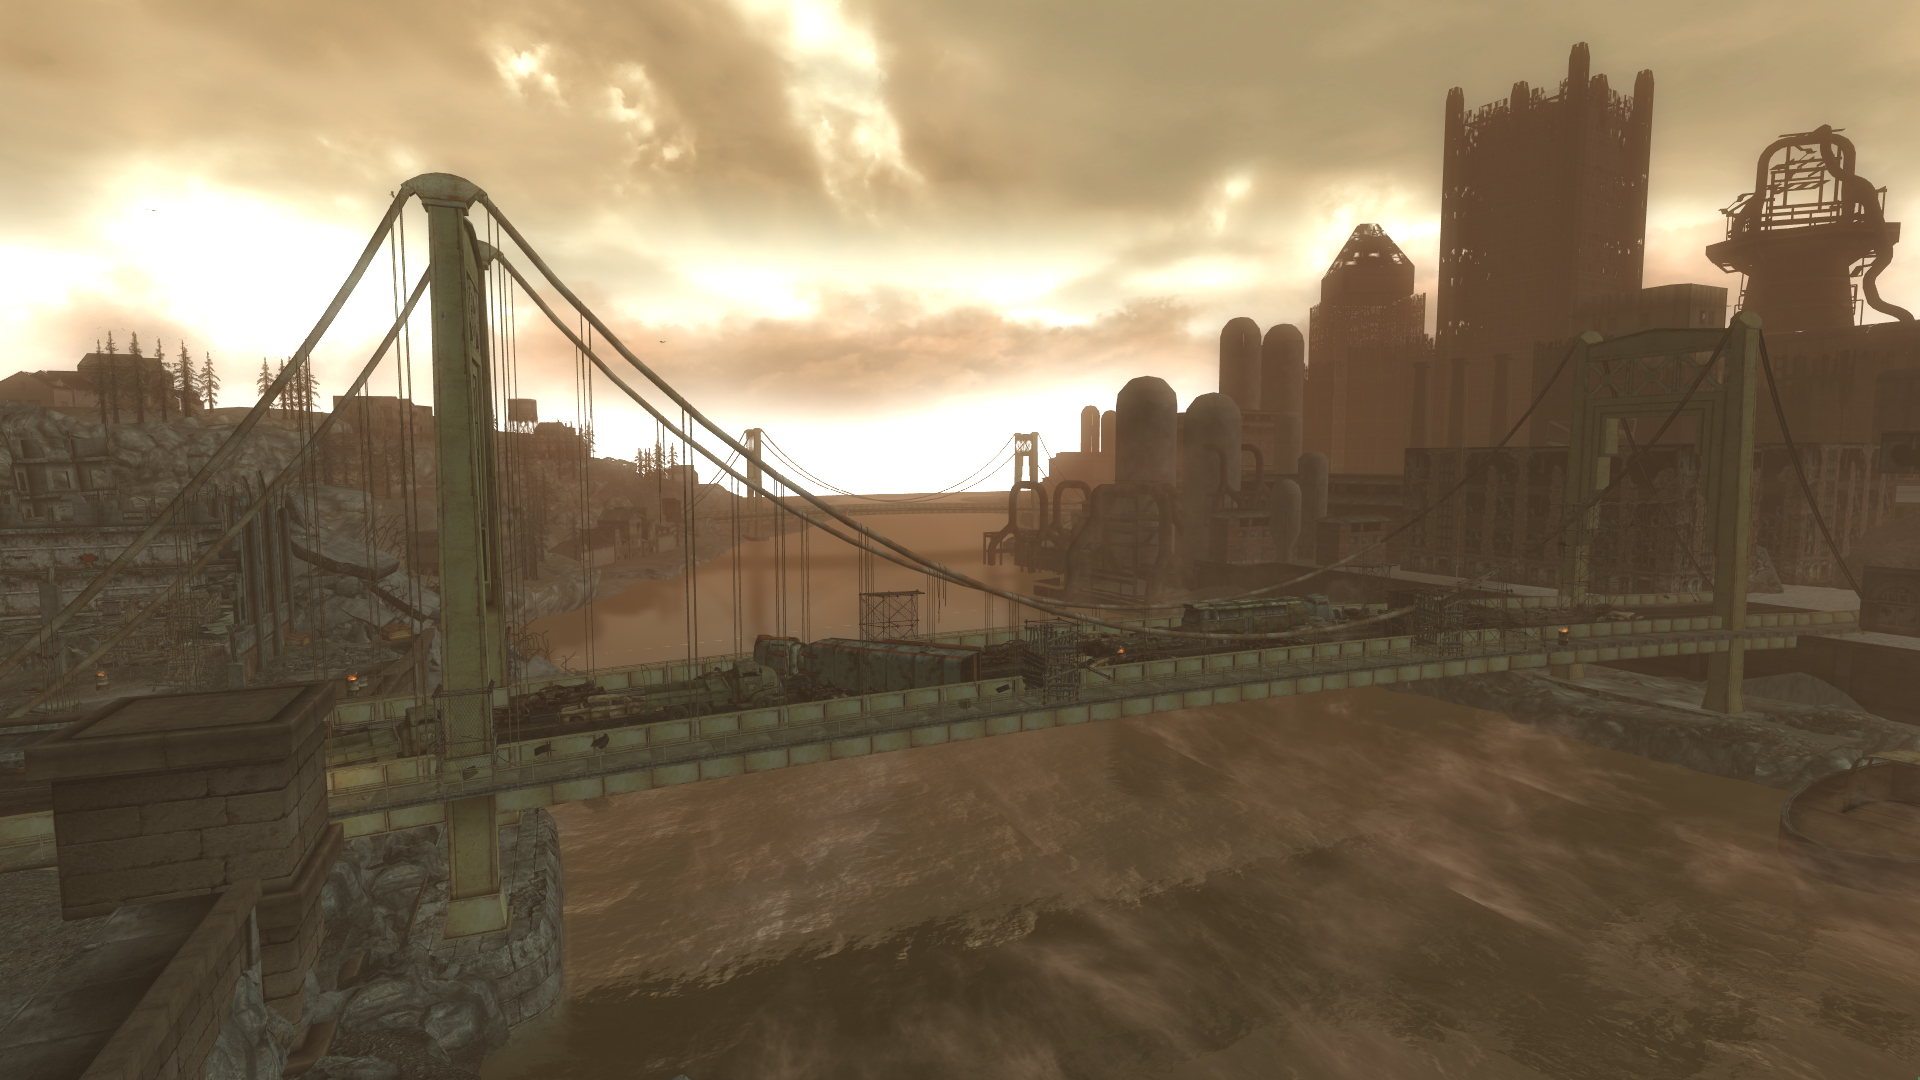 The Pitt Bridge The Pitt Bridge